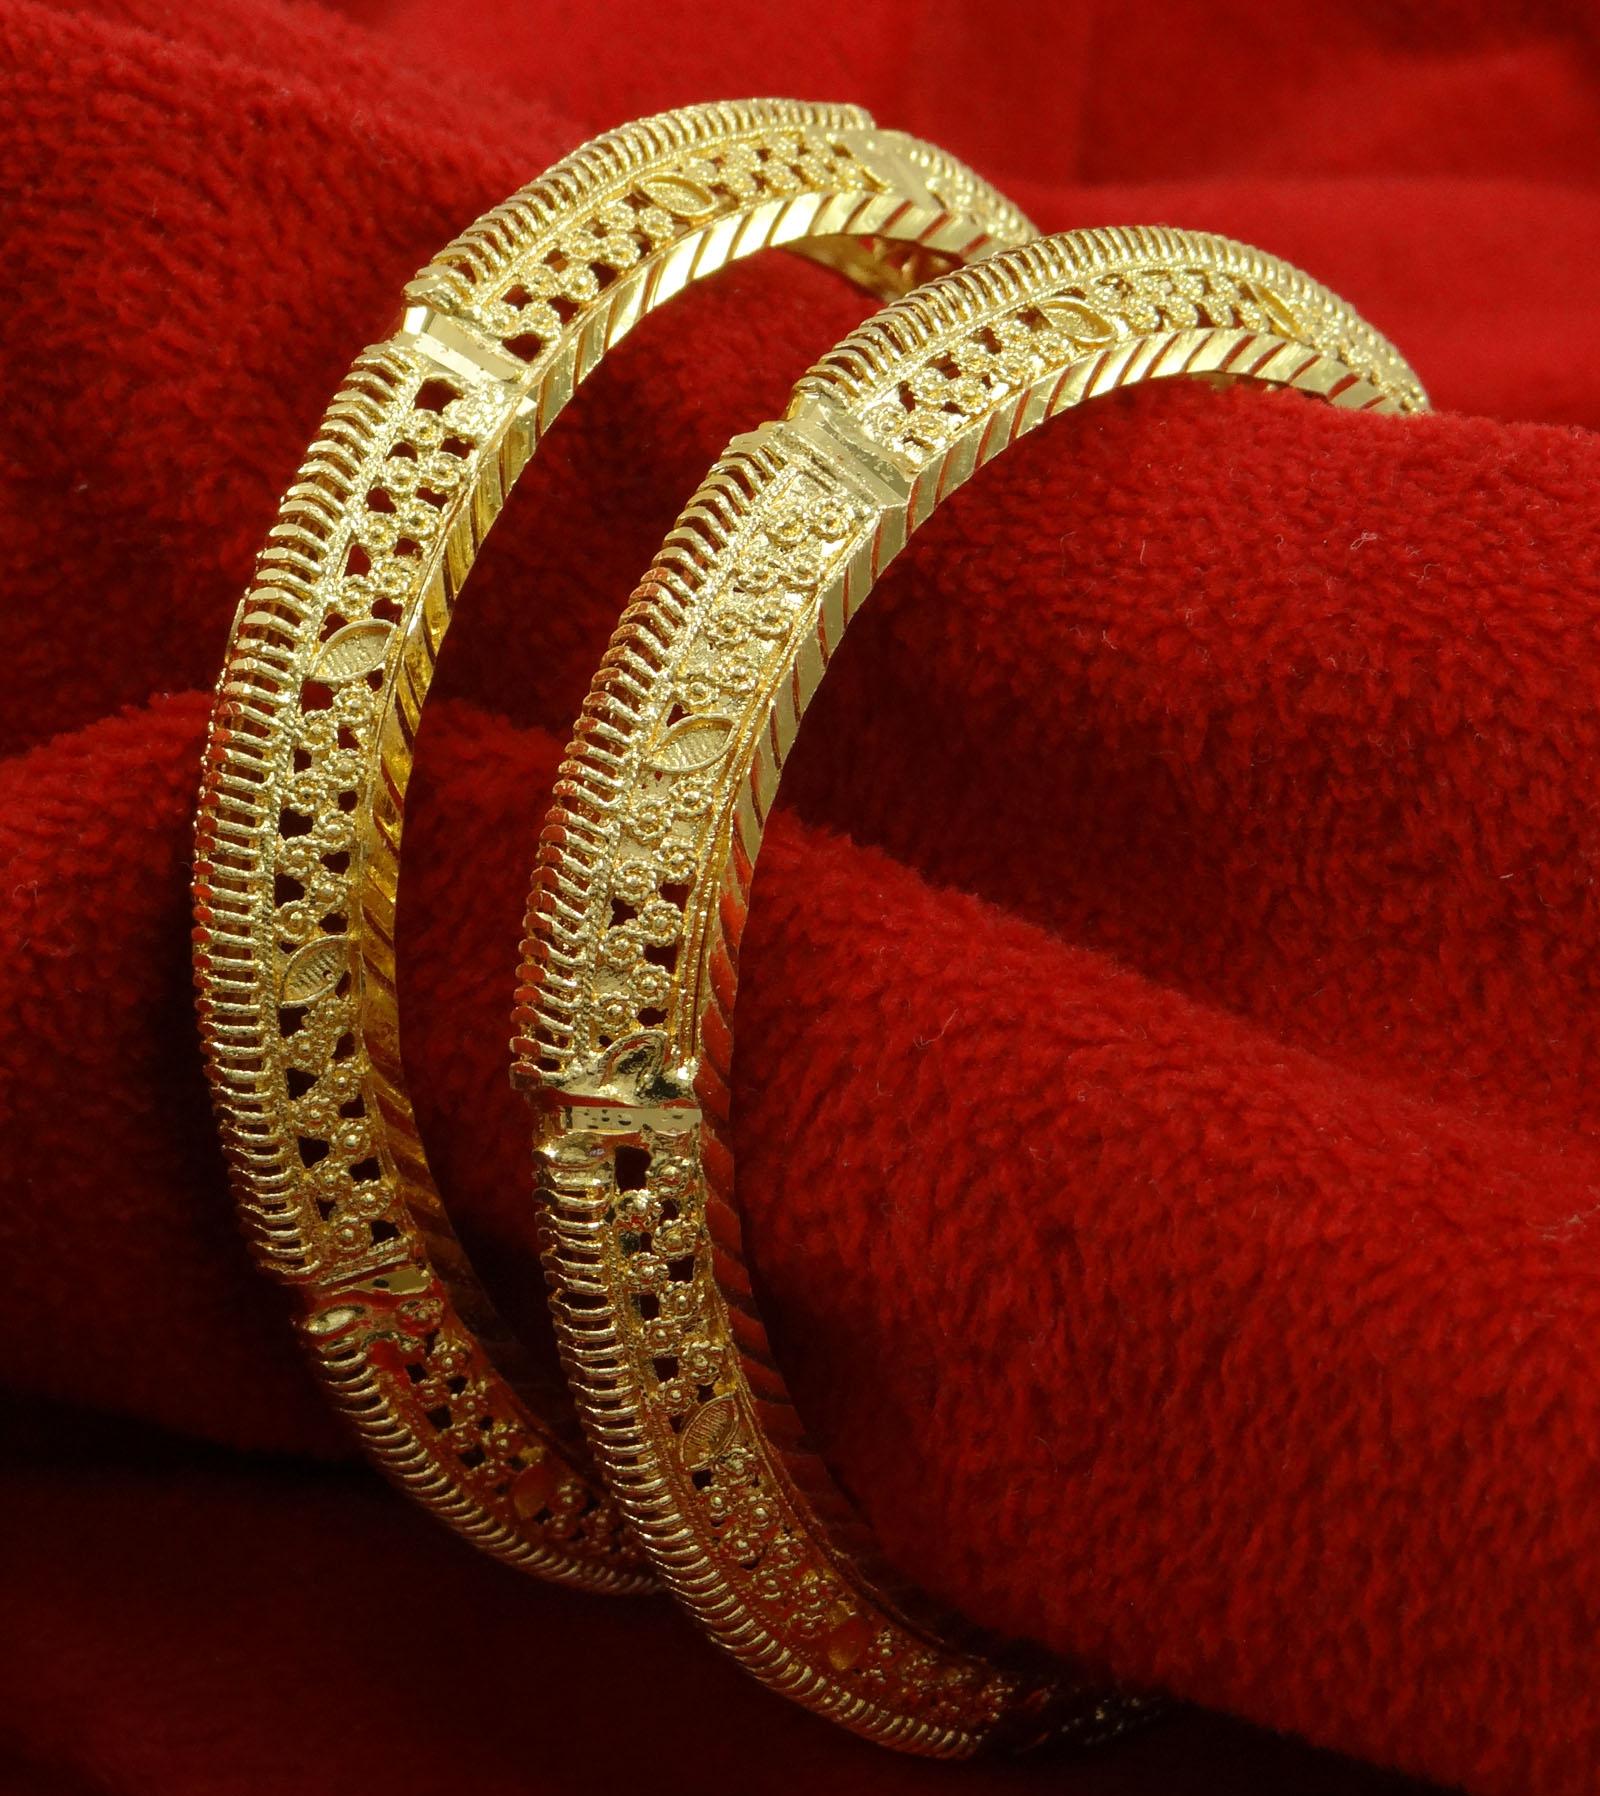 2*8 BSG19C-PAR Gold Plated Traditional Kada Bangle Set Women Jewelry Size 2*6